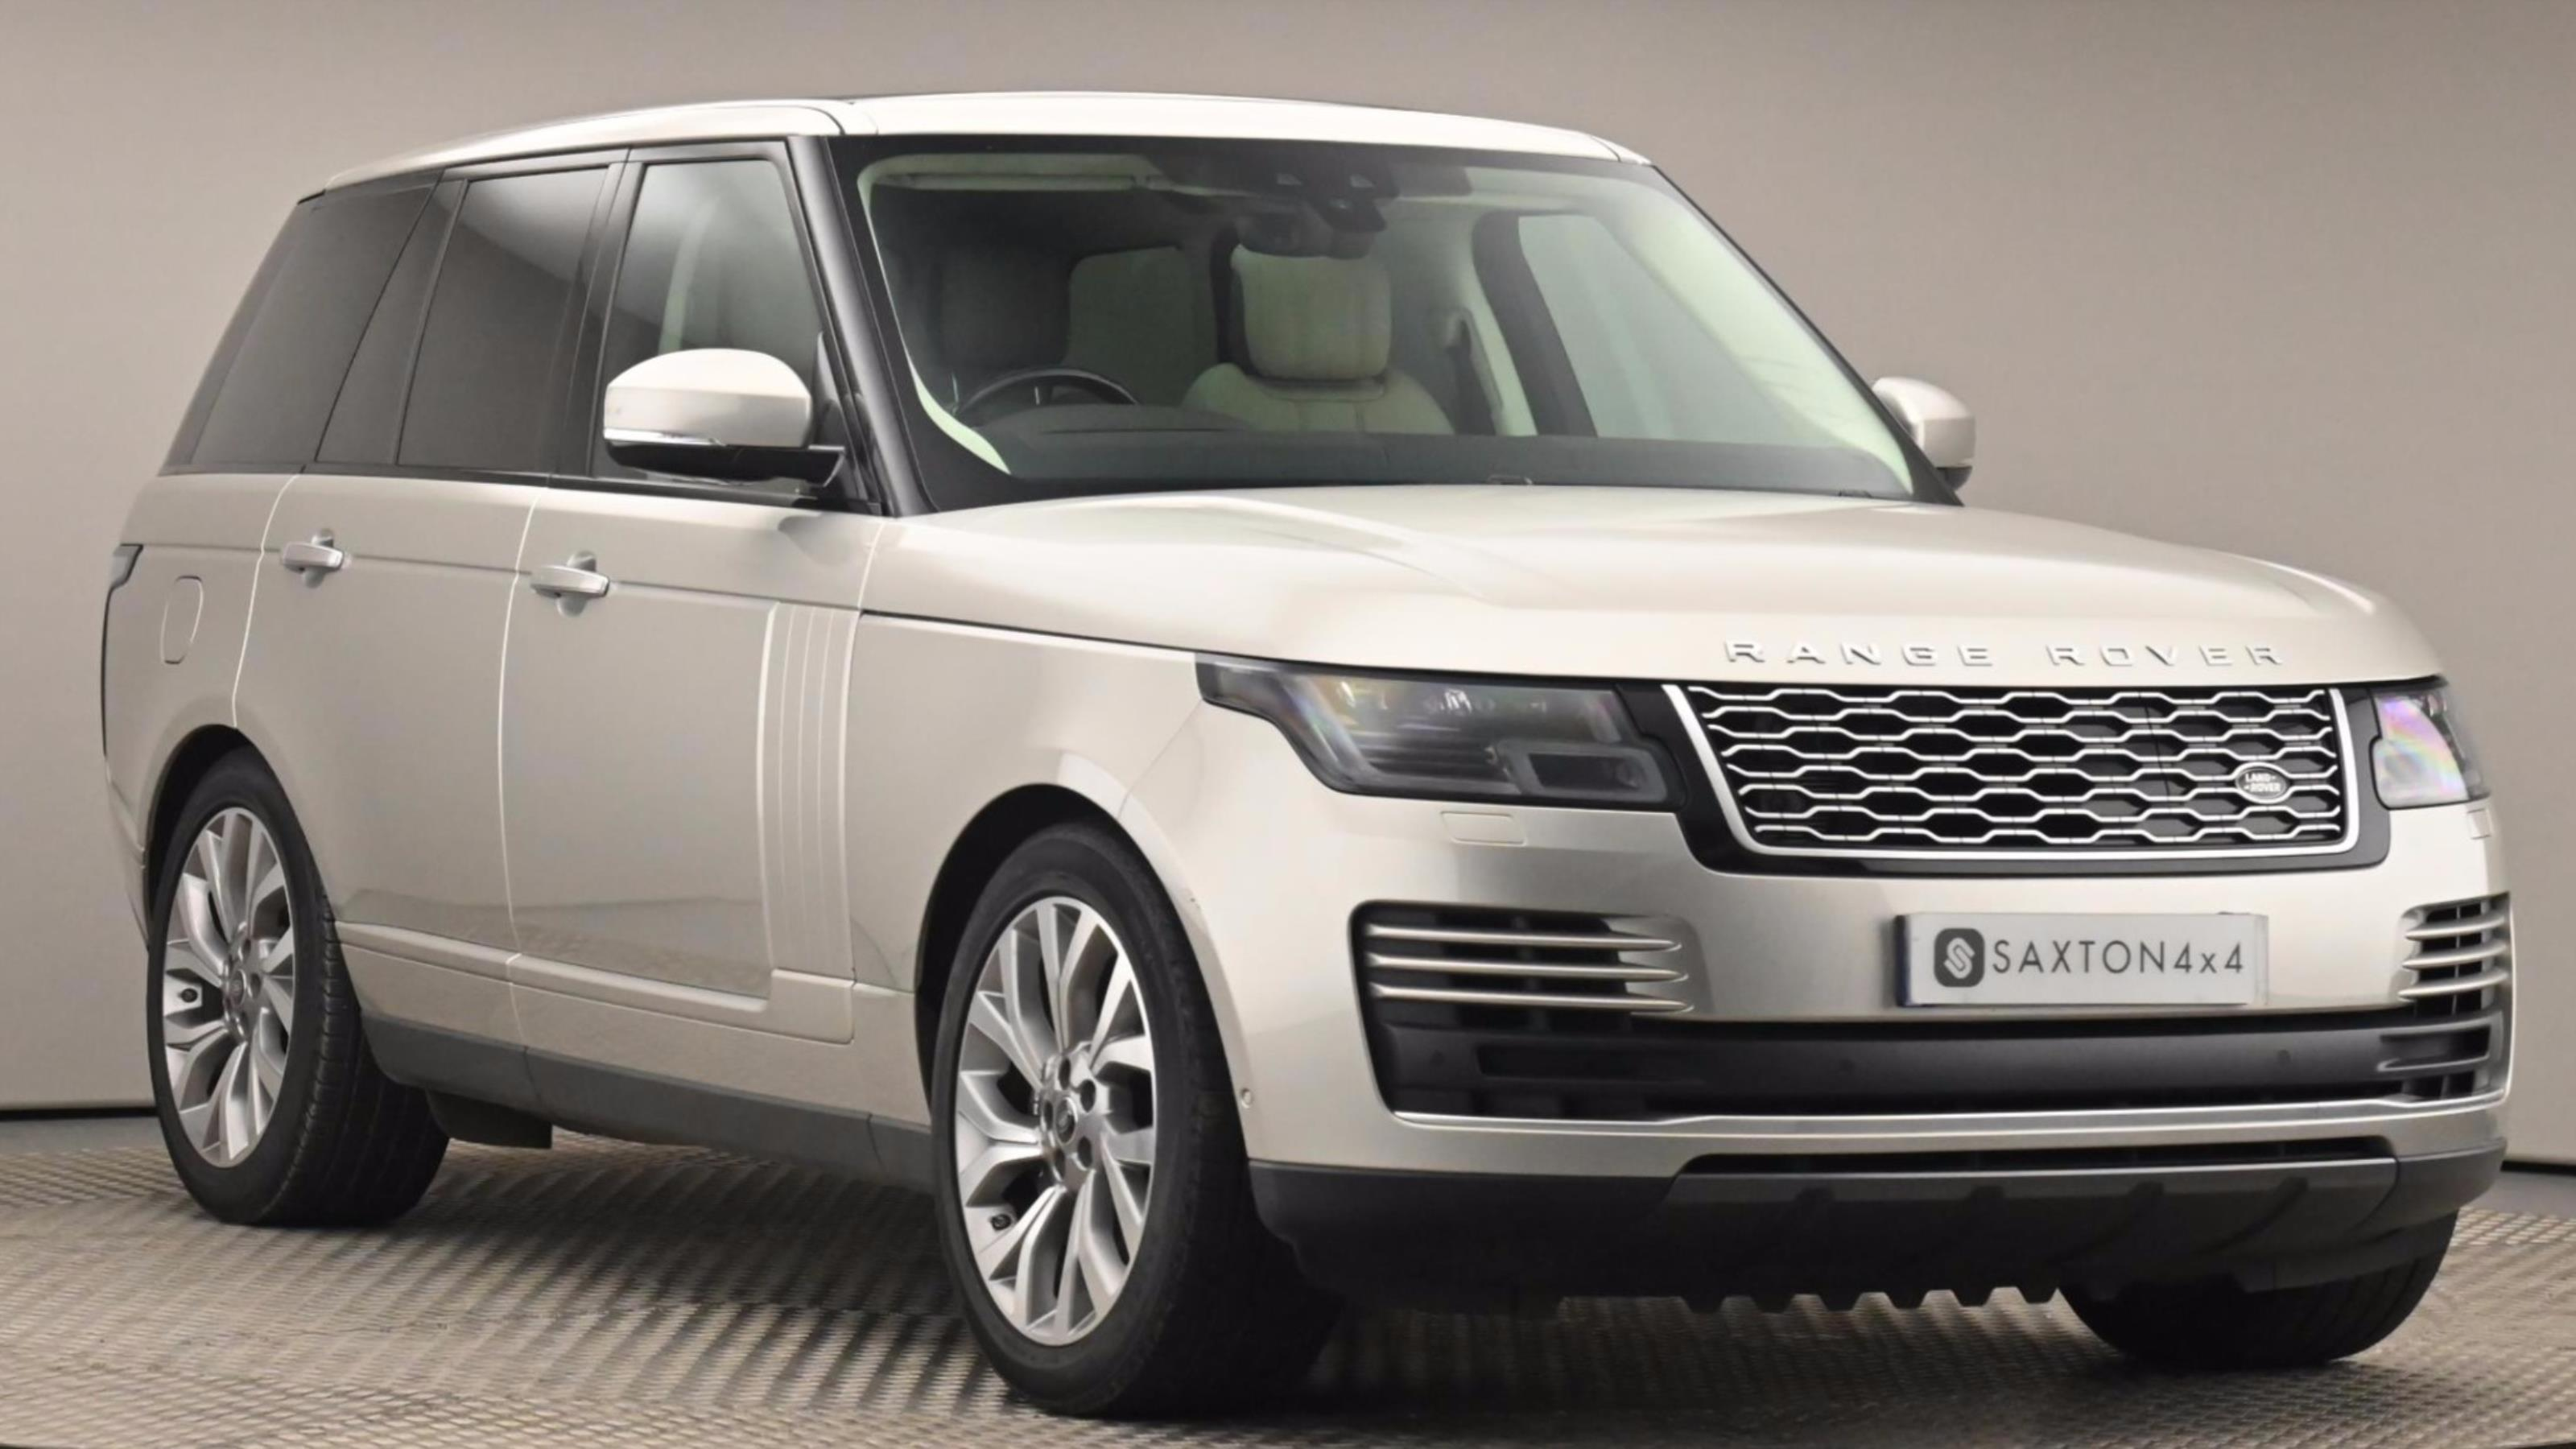 Used 2018 Land Rover RANGE ROVER 2.0 P400e Vogue SE 4dr Auto ~ at Saxton4x4